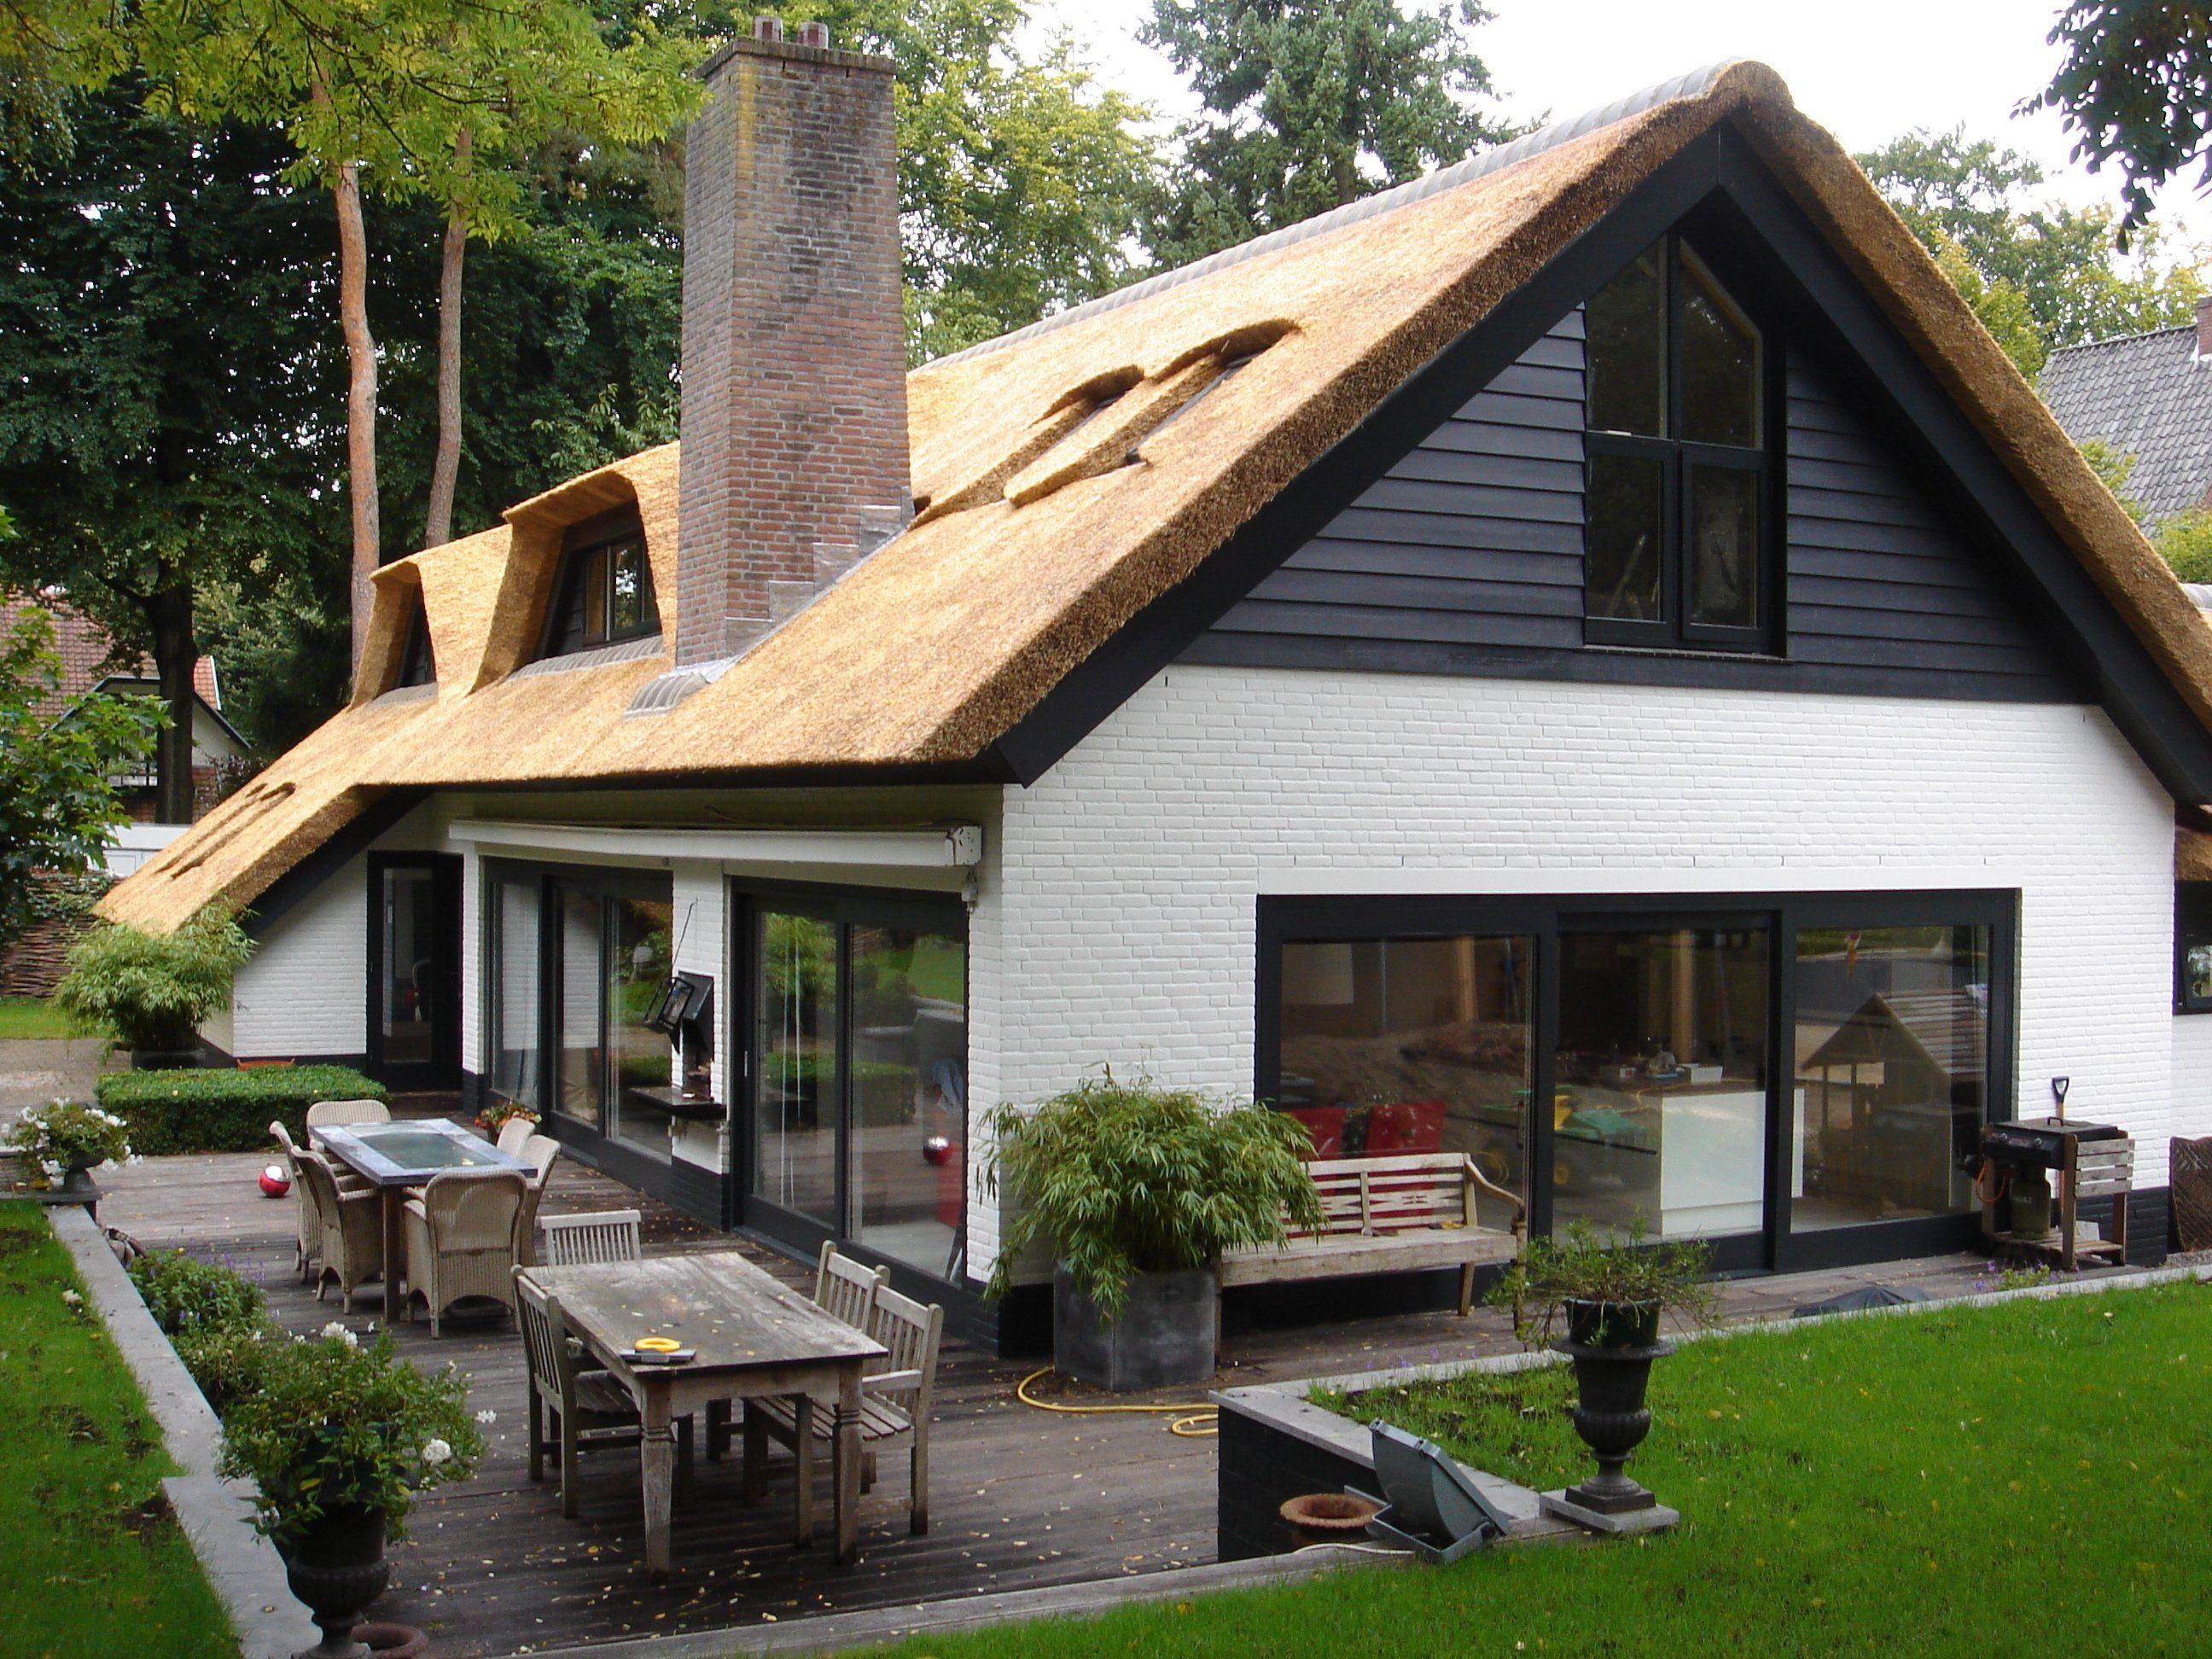 Van pannen naar rieten dak simple househouse planscottagearchitecturebungalownetherlandsart nouveauexterior